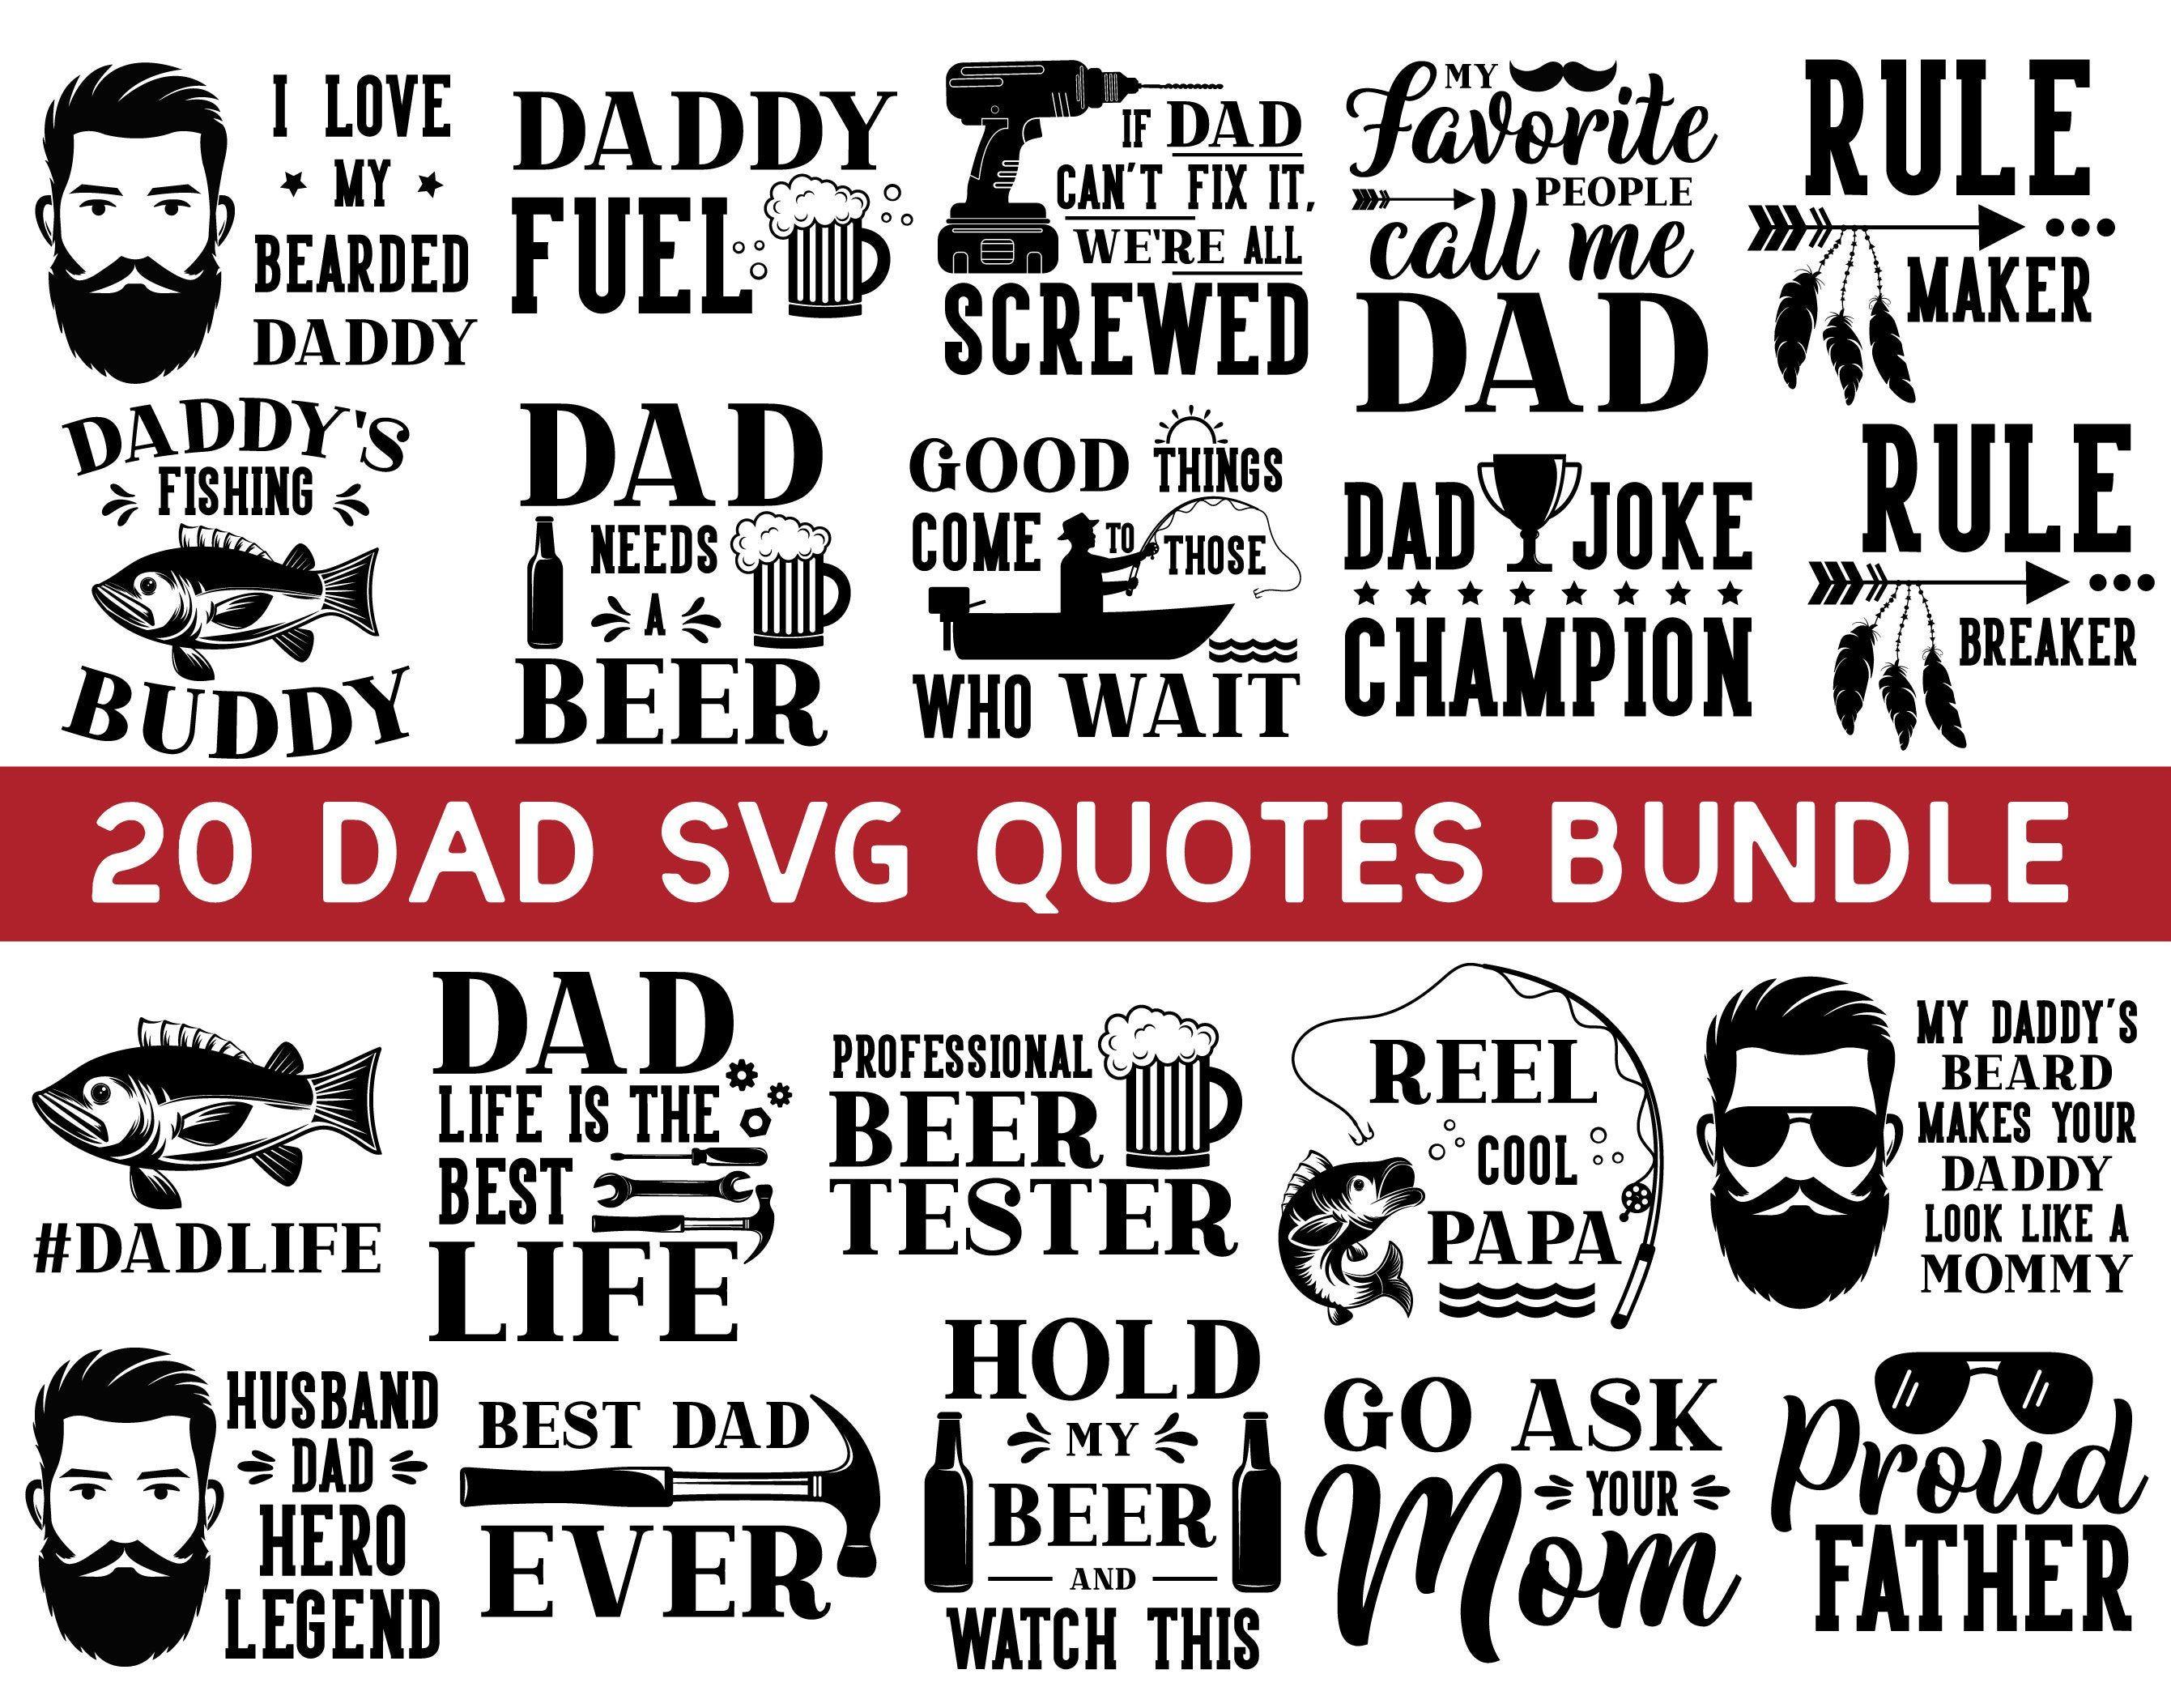 Download Dad Svg Bundle Dad Svg Daddy Svg Father S Day Svg Papa Etsy Dad Svg Fathers Day Svg Dad Quotes